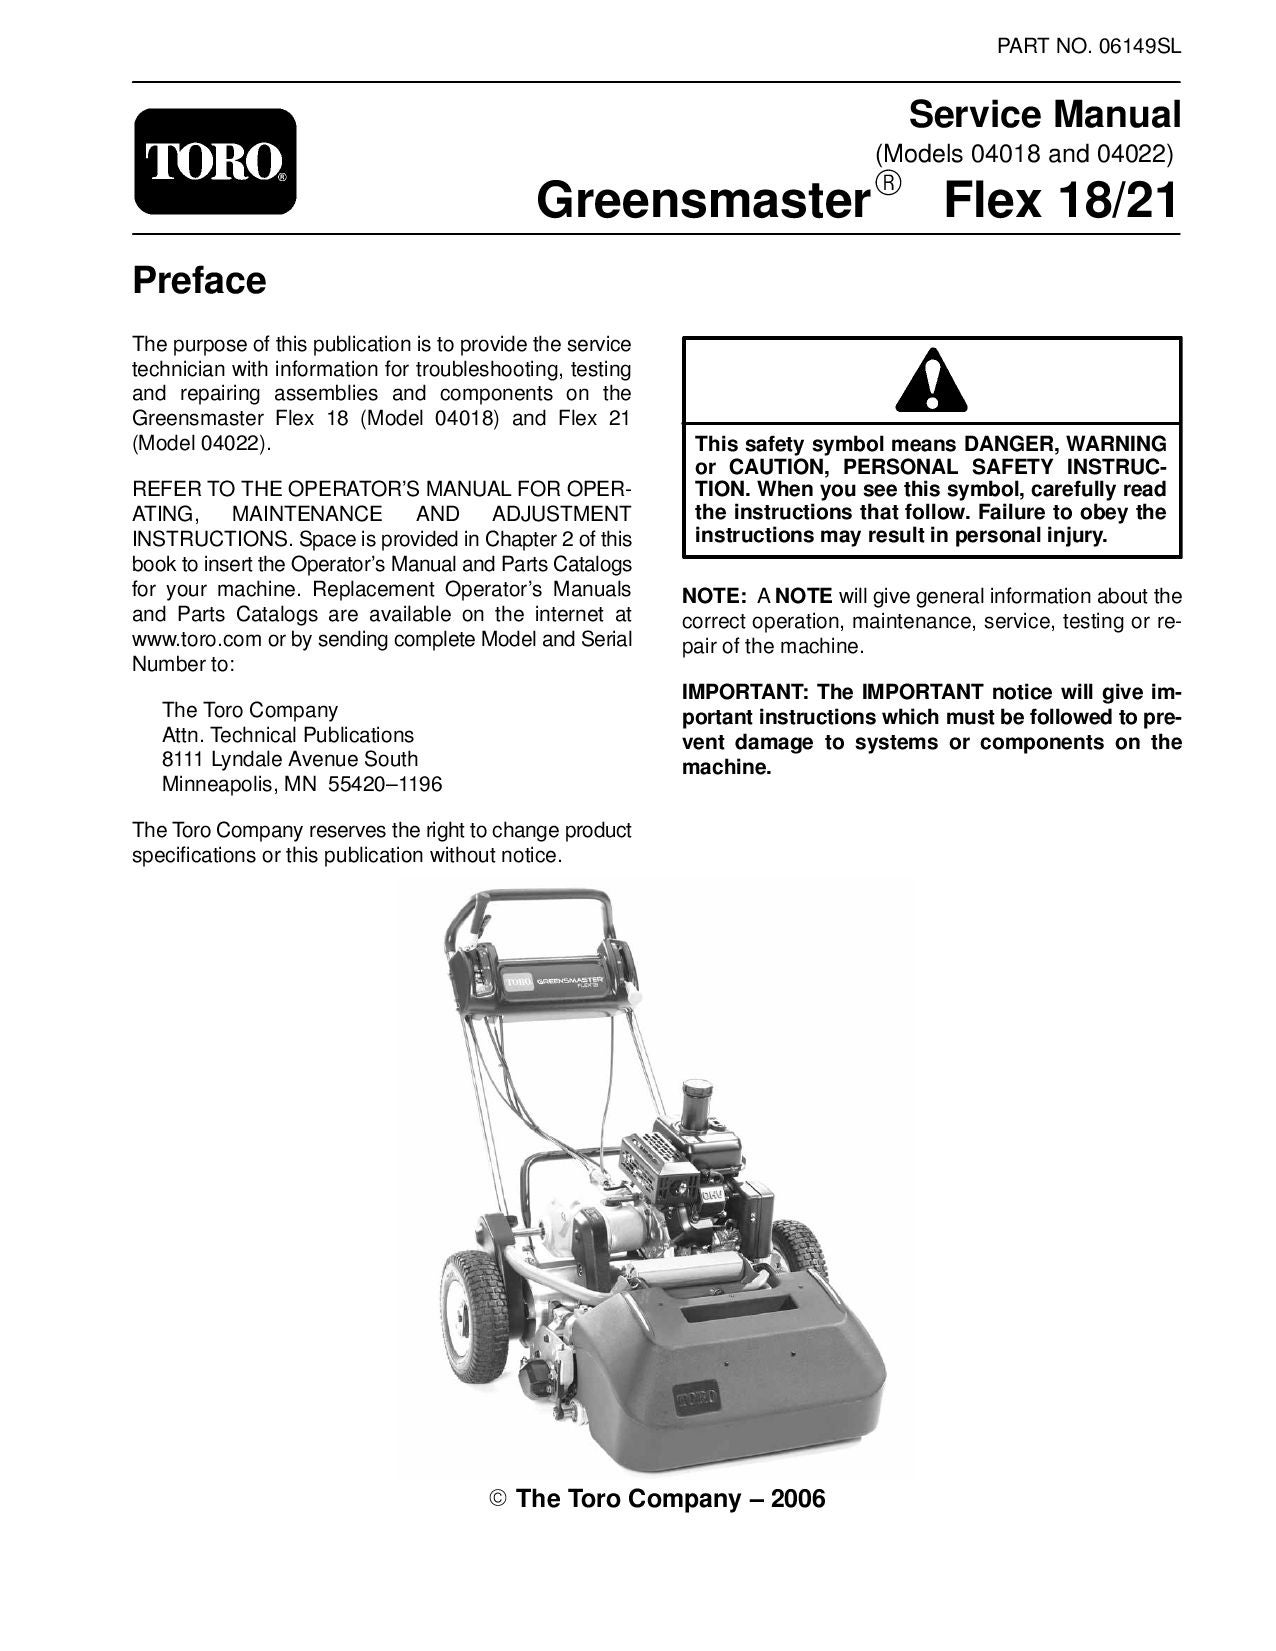 06149sl pdf Greensmaster Flex 18/21 (Model 04018 and 04022) Dec